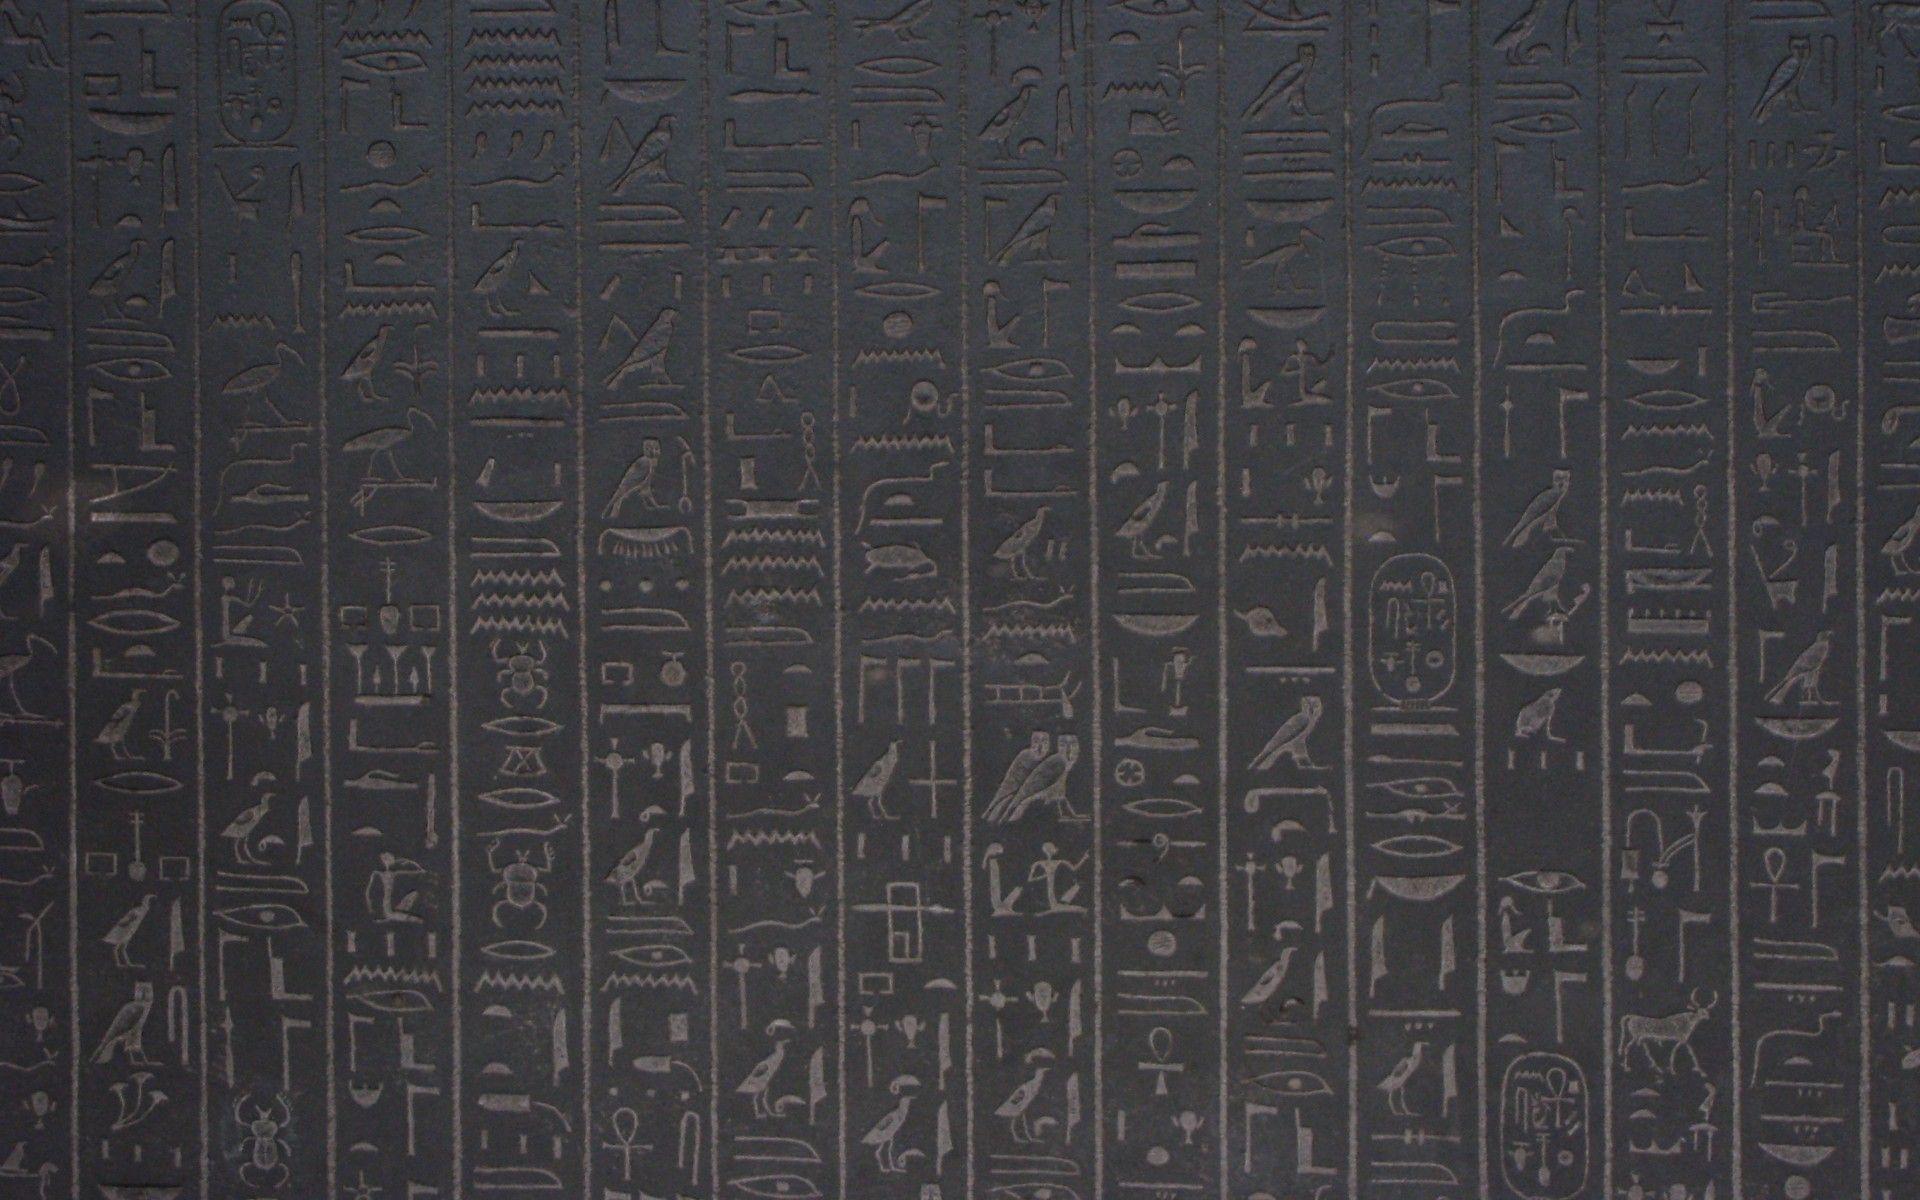 Egyptian Wallpaper Egypt Wallpaper Egyptian Hieroglyphics Hieroglyphics